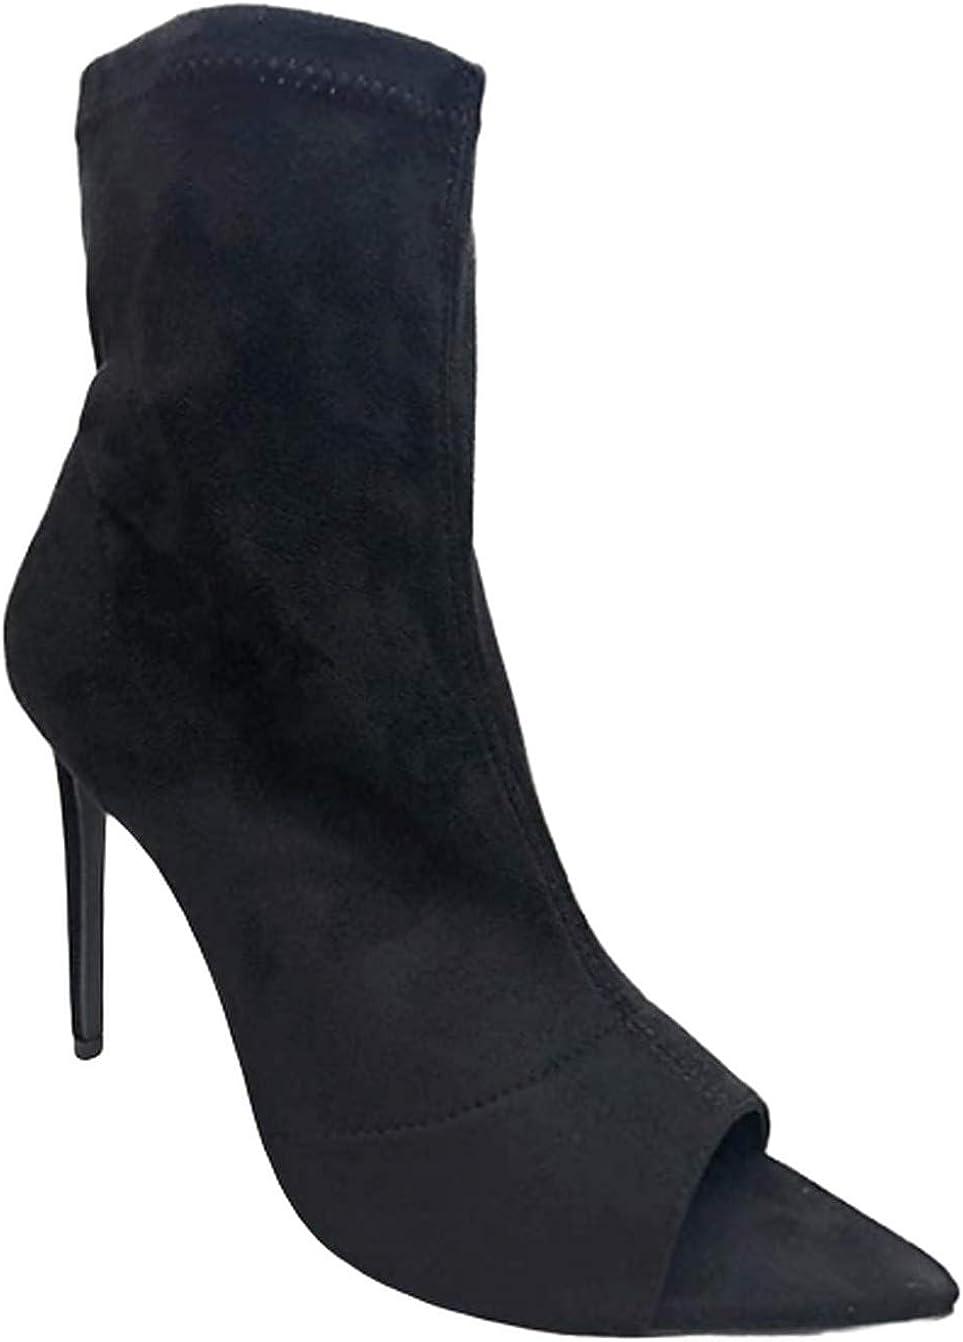 Women's Pointy Peep Toe Stiletto Mid Calf Wrap Stilletto Heel Side Zipper Fastener Bootie